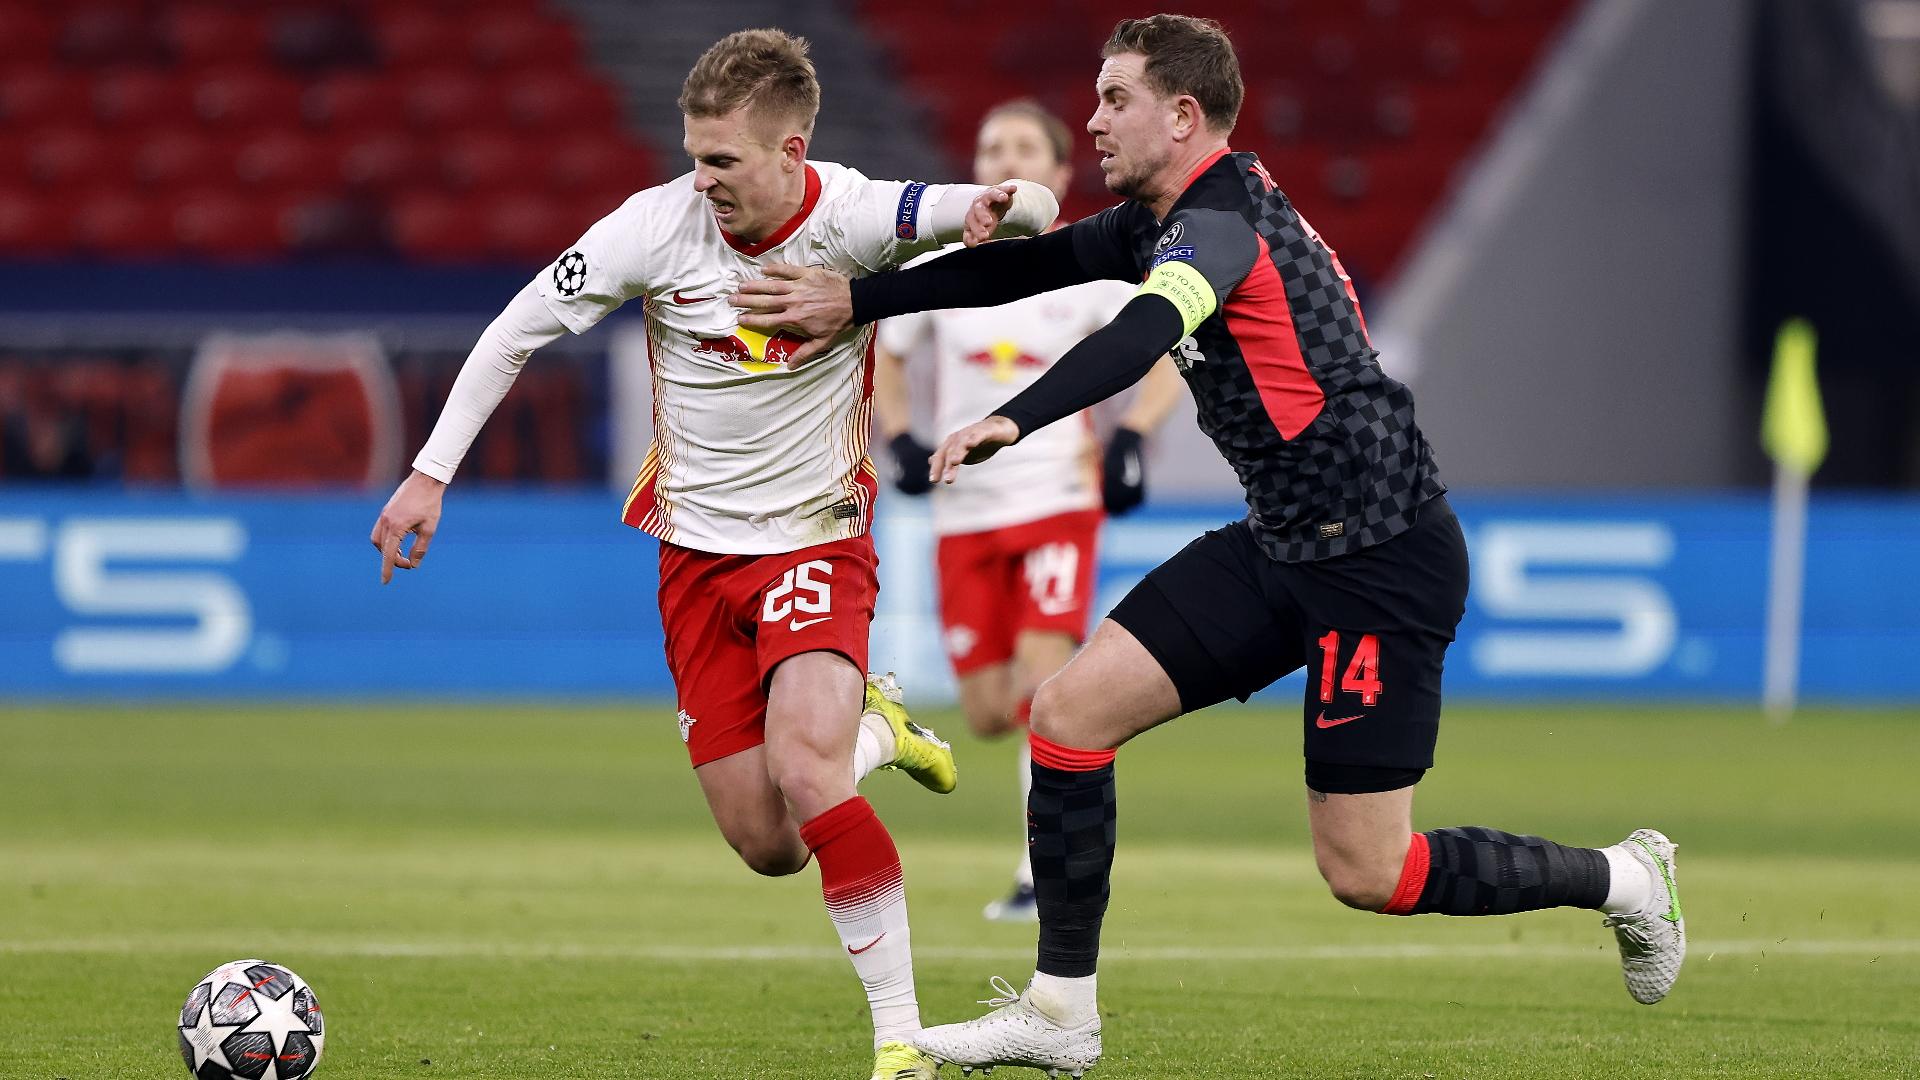 Laporan Pertandingan: RB Leipzig 0-2 Liverpool | Goal.com